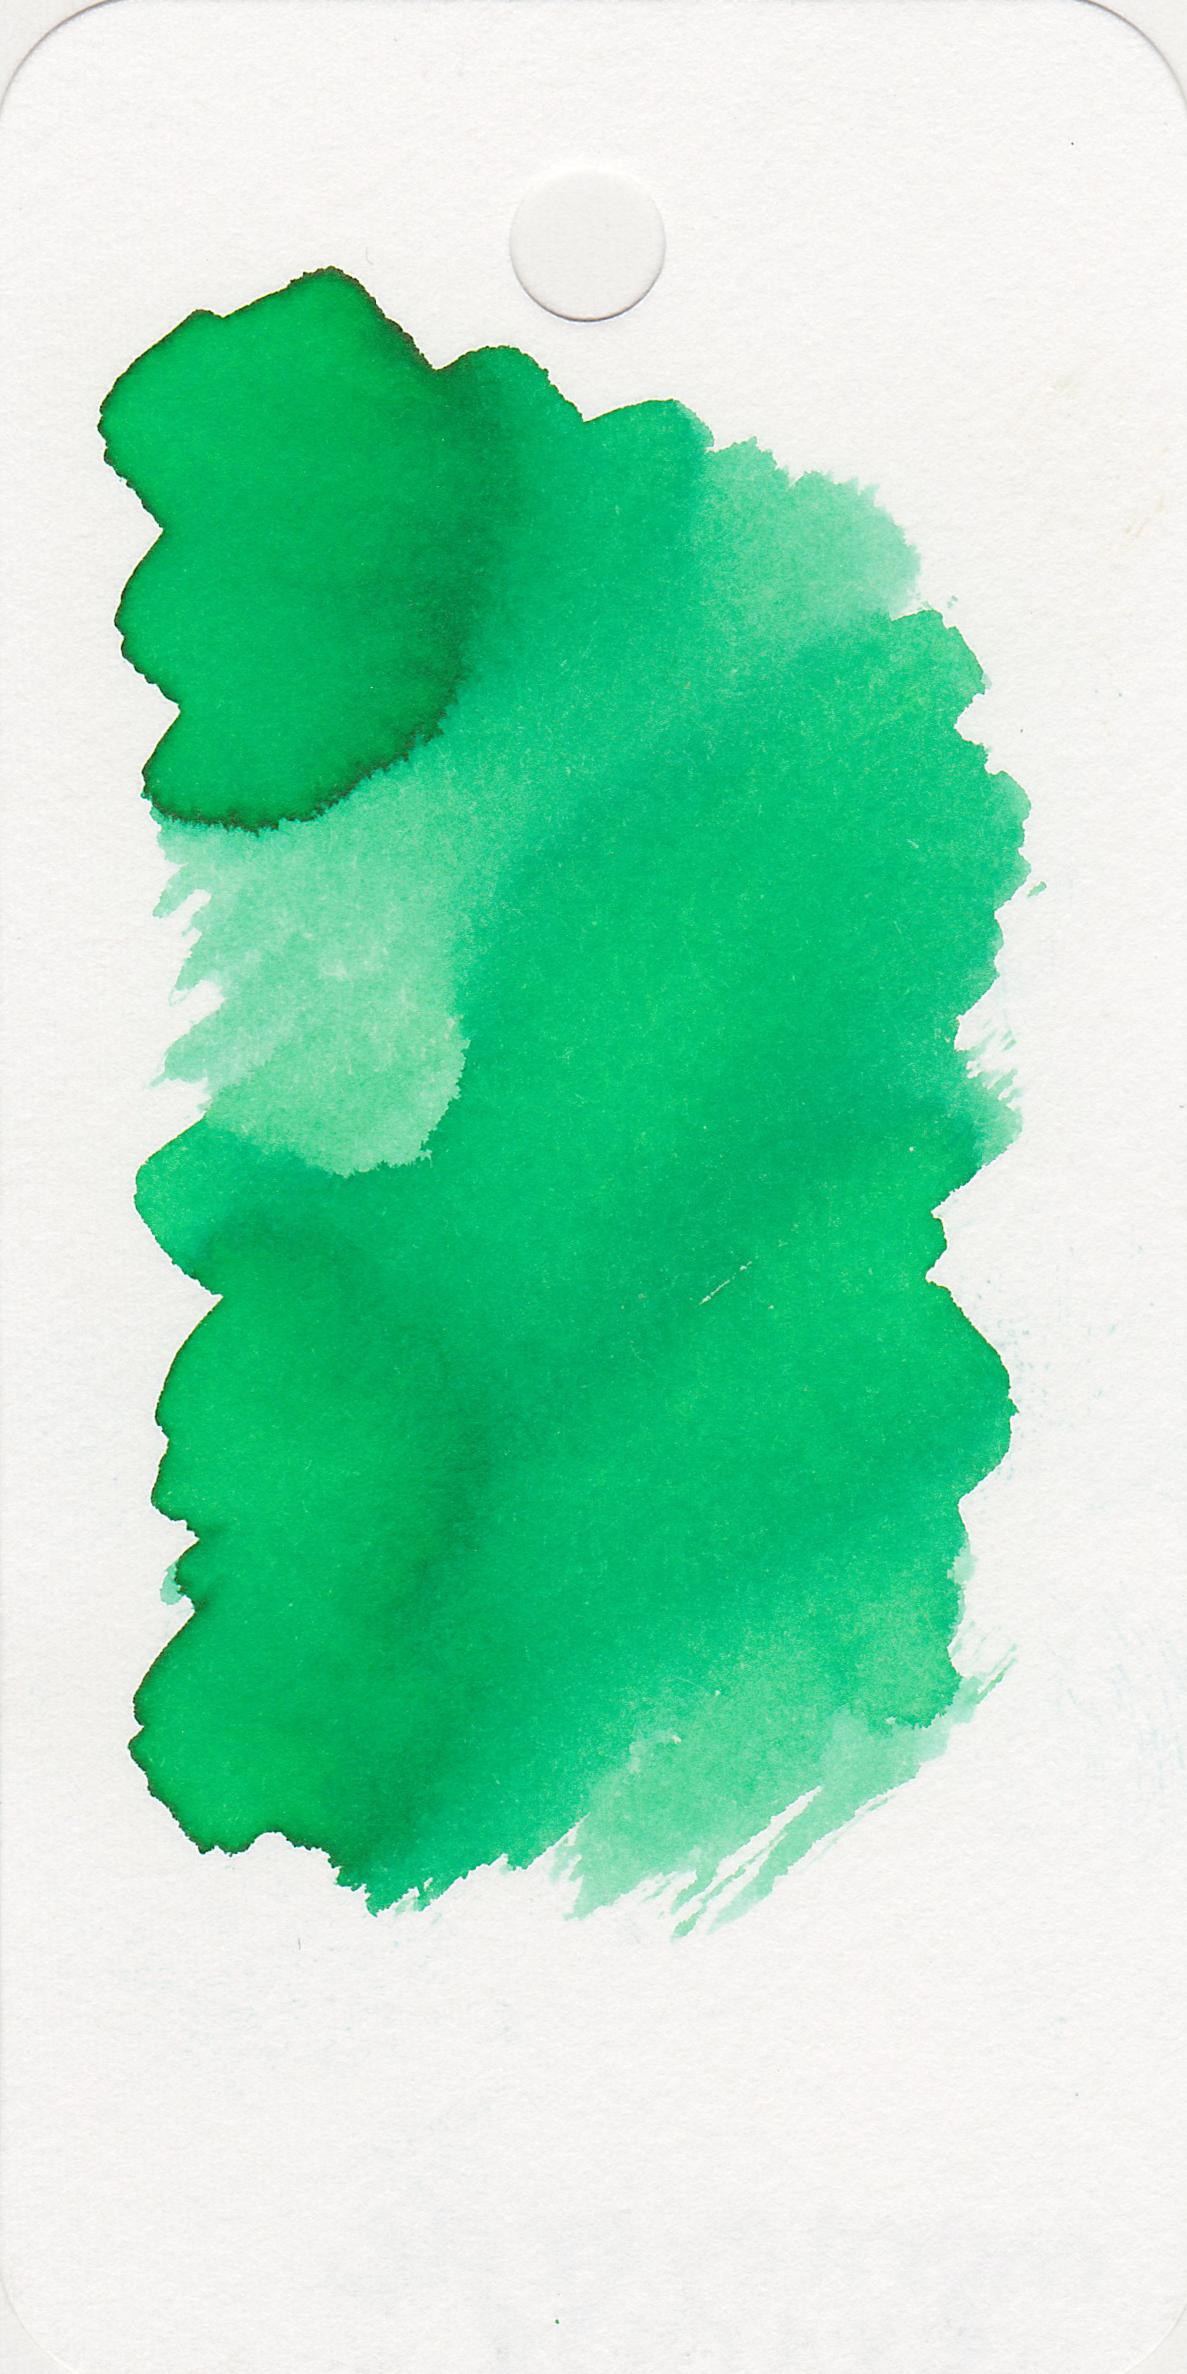 skr-emerald-green-2.jpg